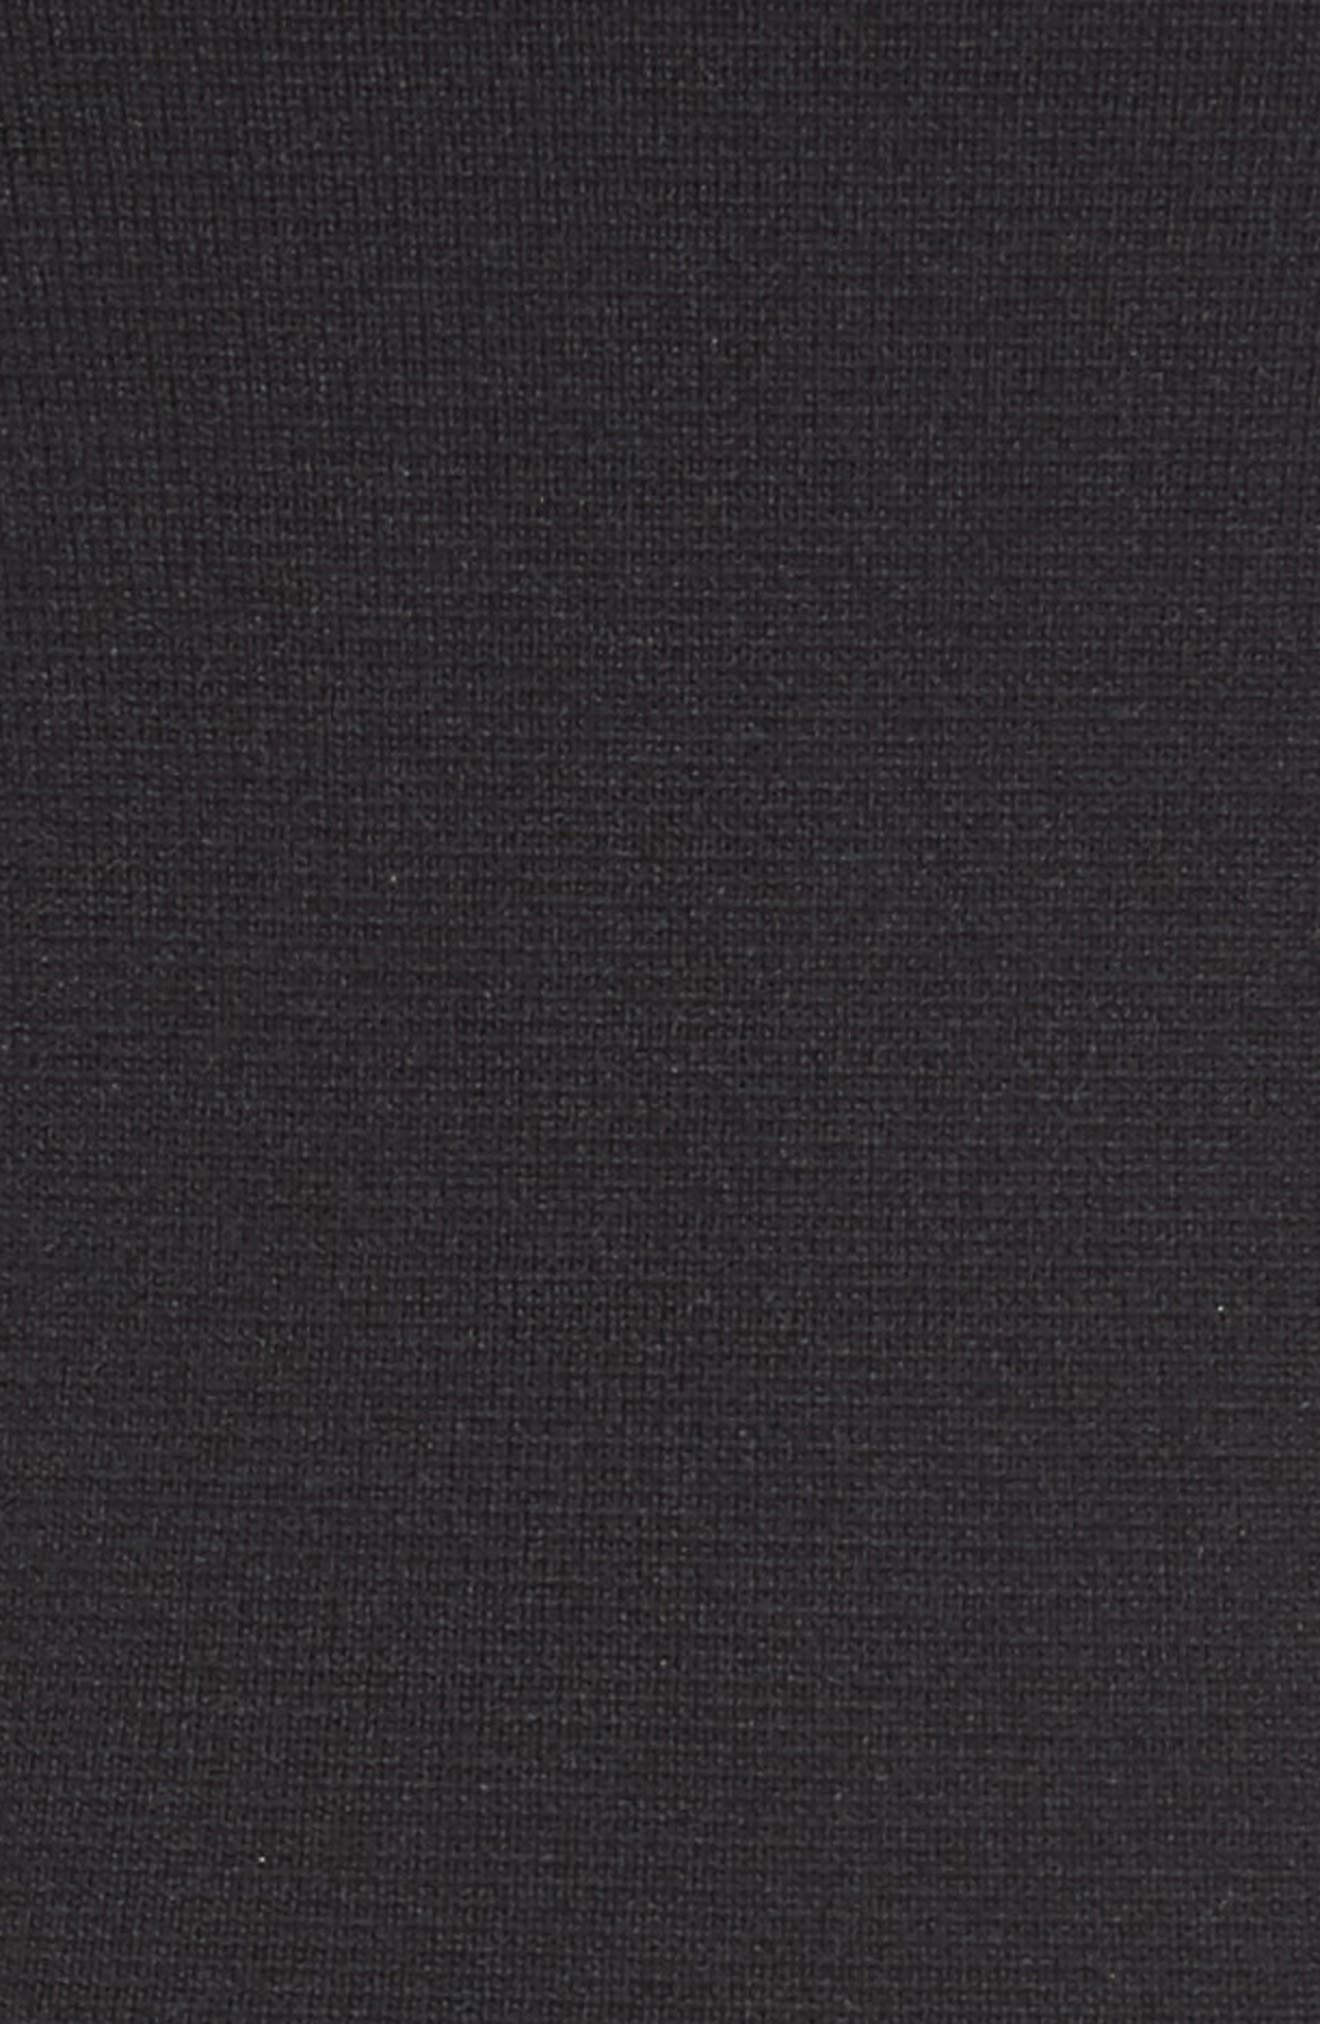 Ryker Fit & Flare Dress,                             Alternate thumbnail 5, color,                             001